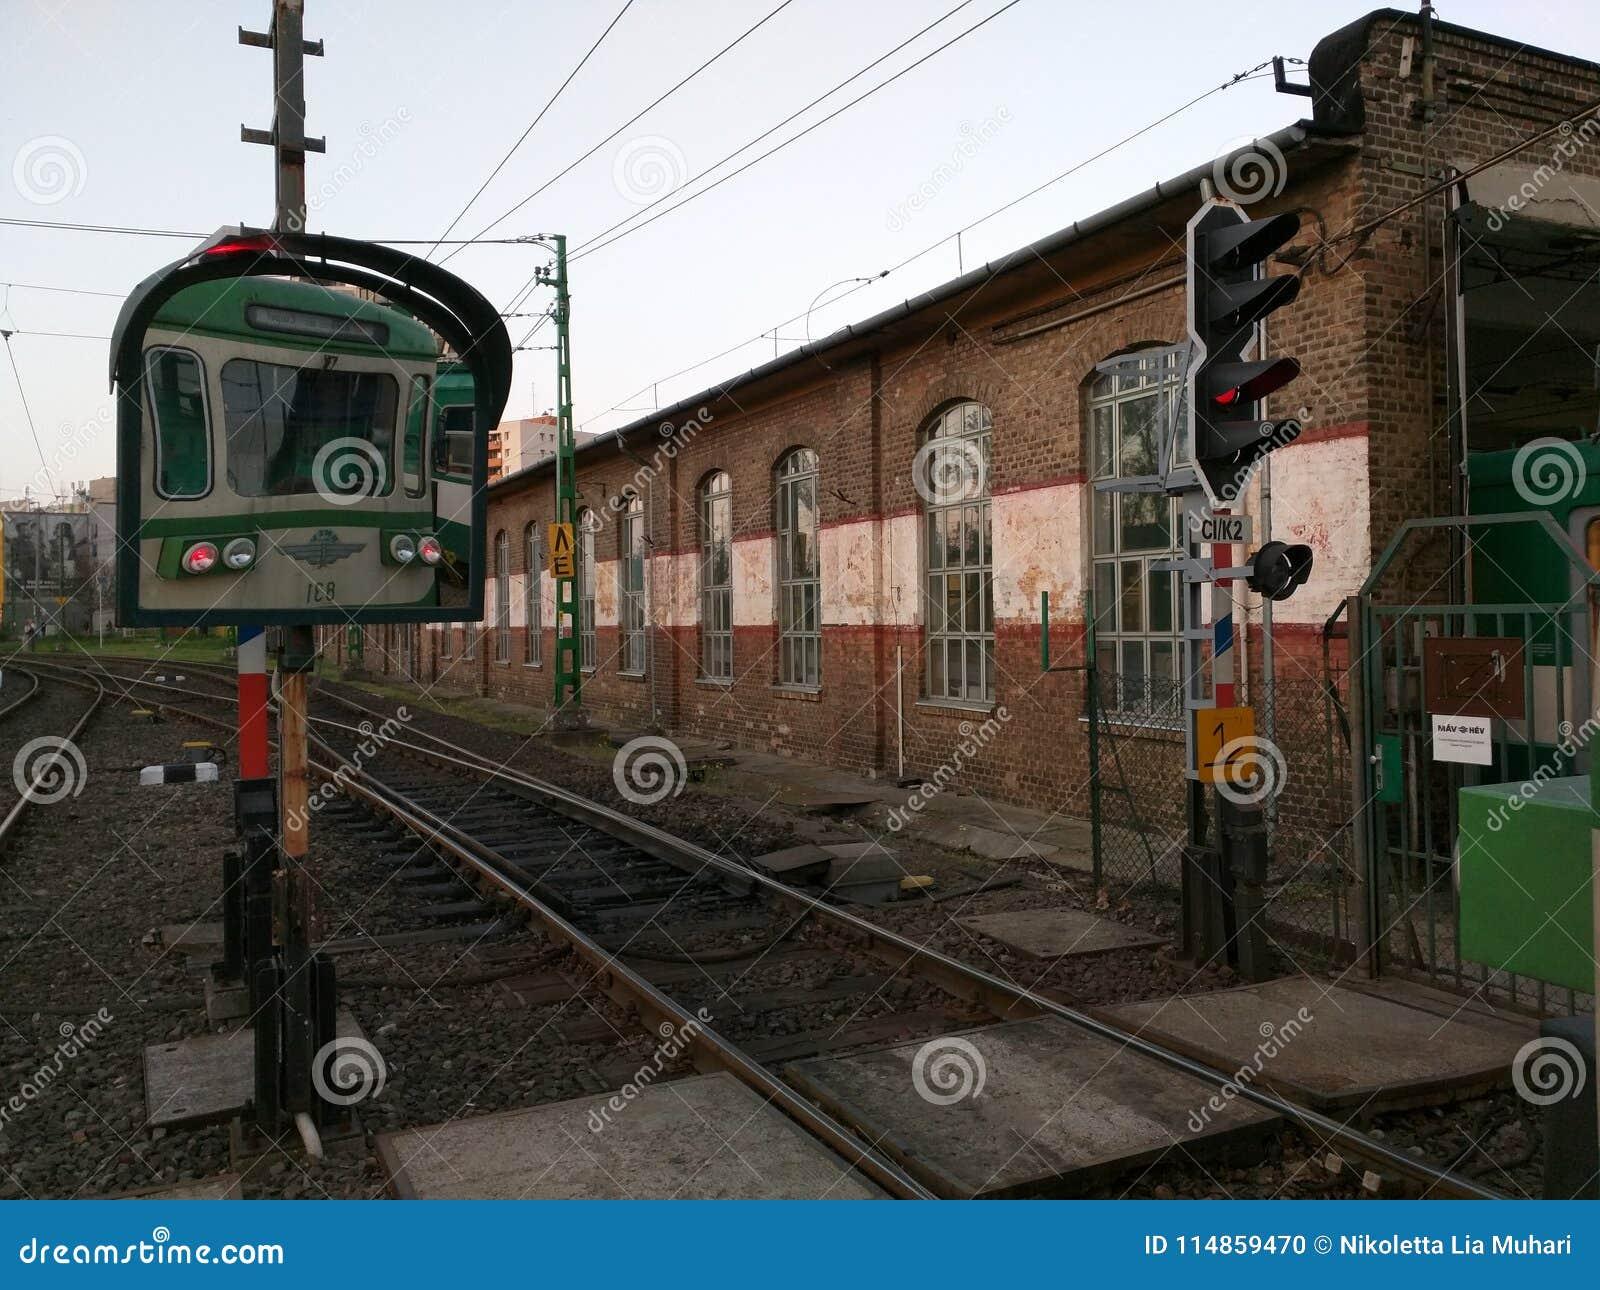 Post HÃ ‰ V in Boedapest, Hongarije